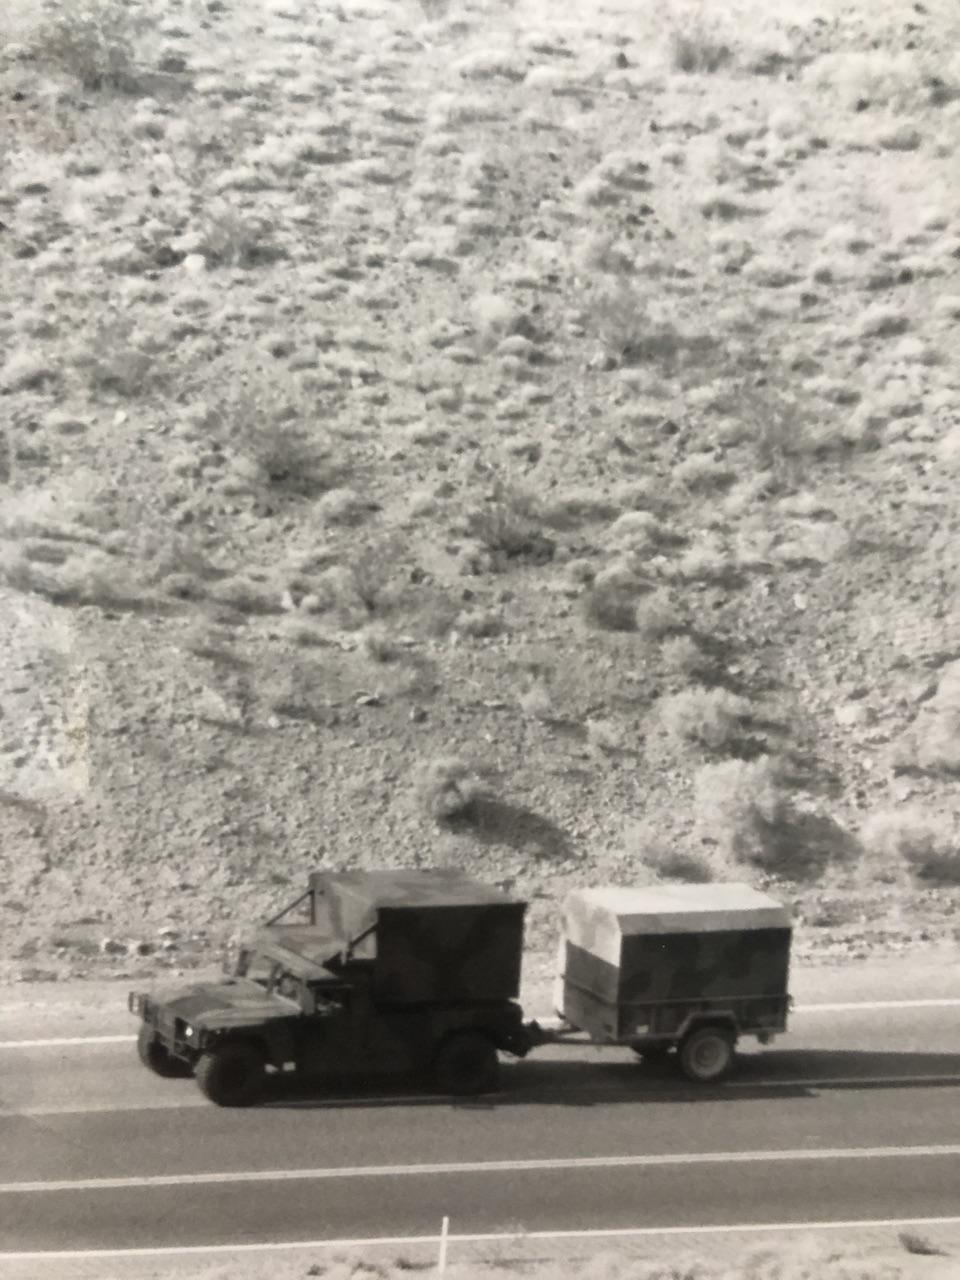 Image of Army Vehicle at Army Base